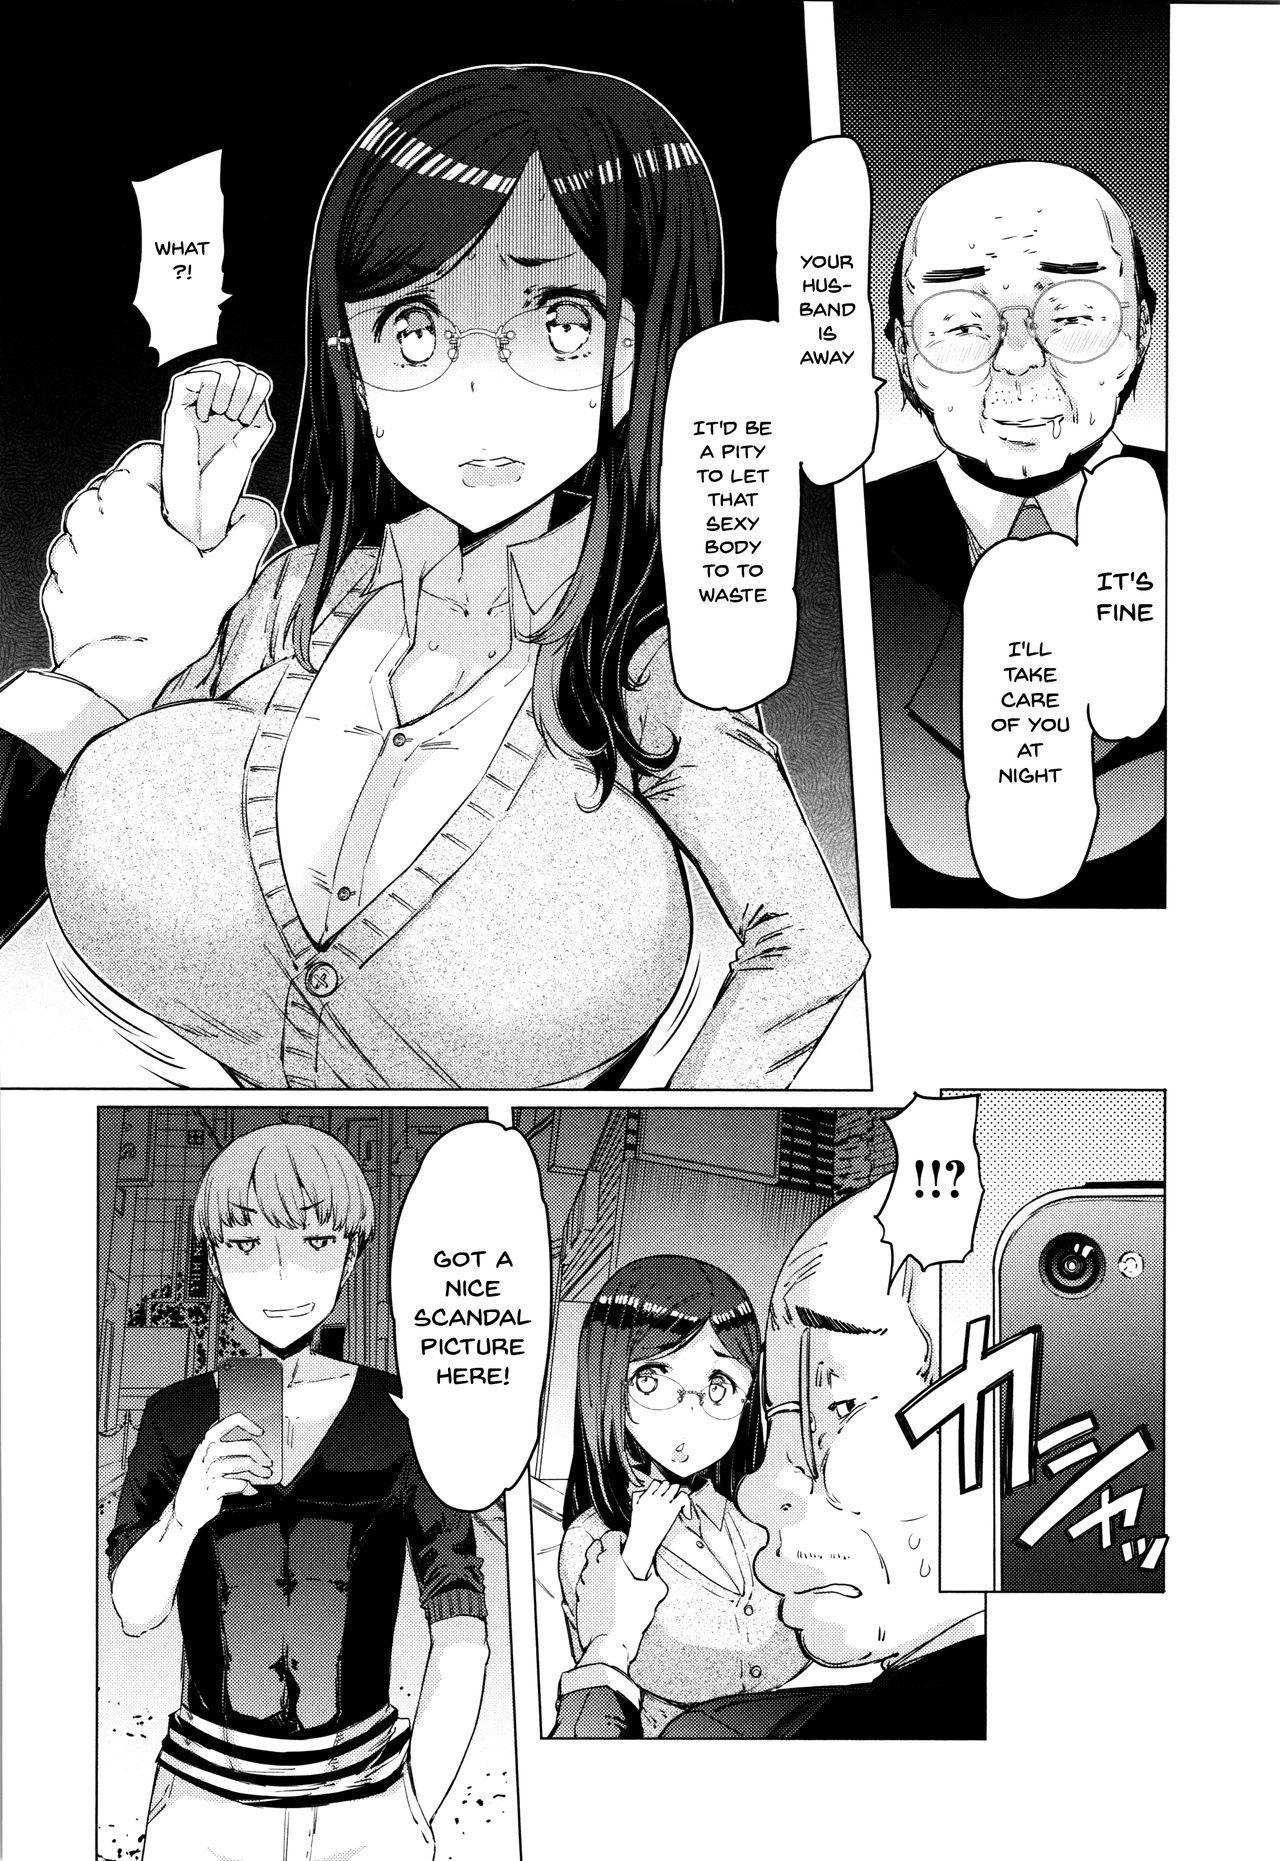 Hitozuma ga Ero Sugite Shigoto ni Naranai! | These Housewives Are Too Lewd I Can't Help It! 45